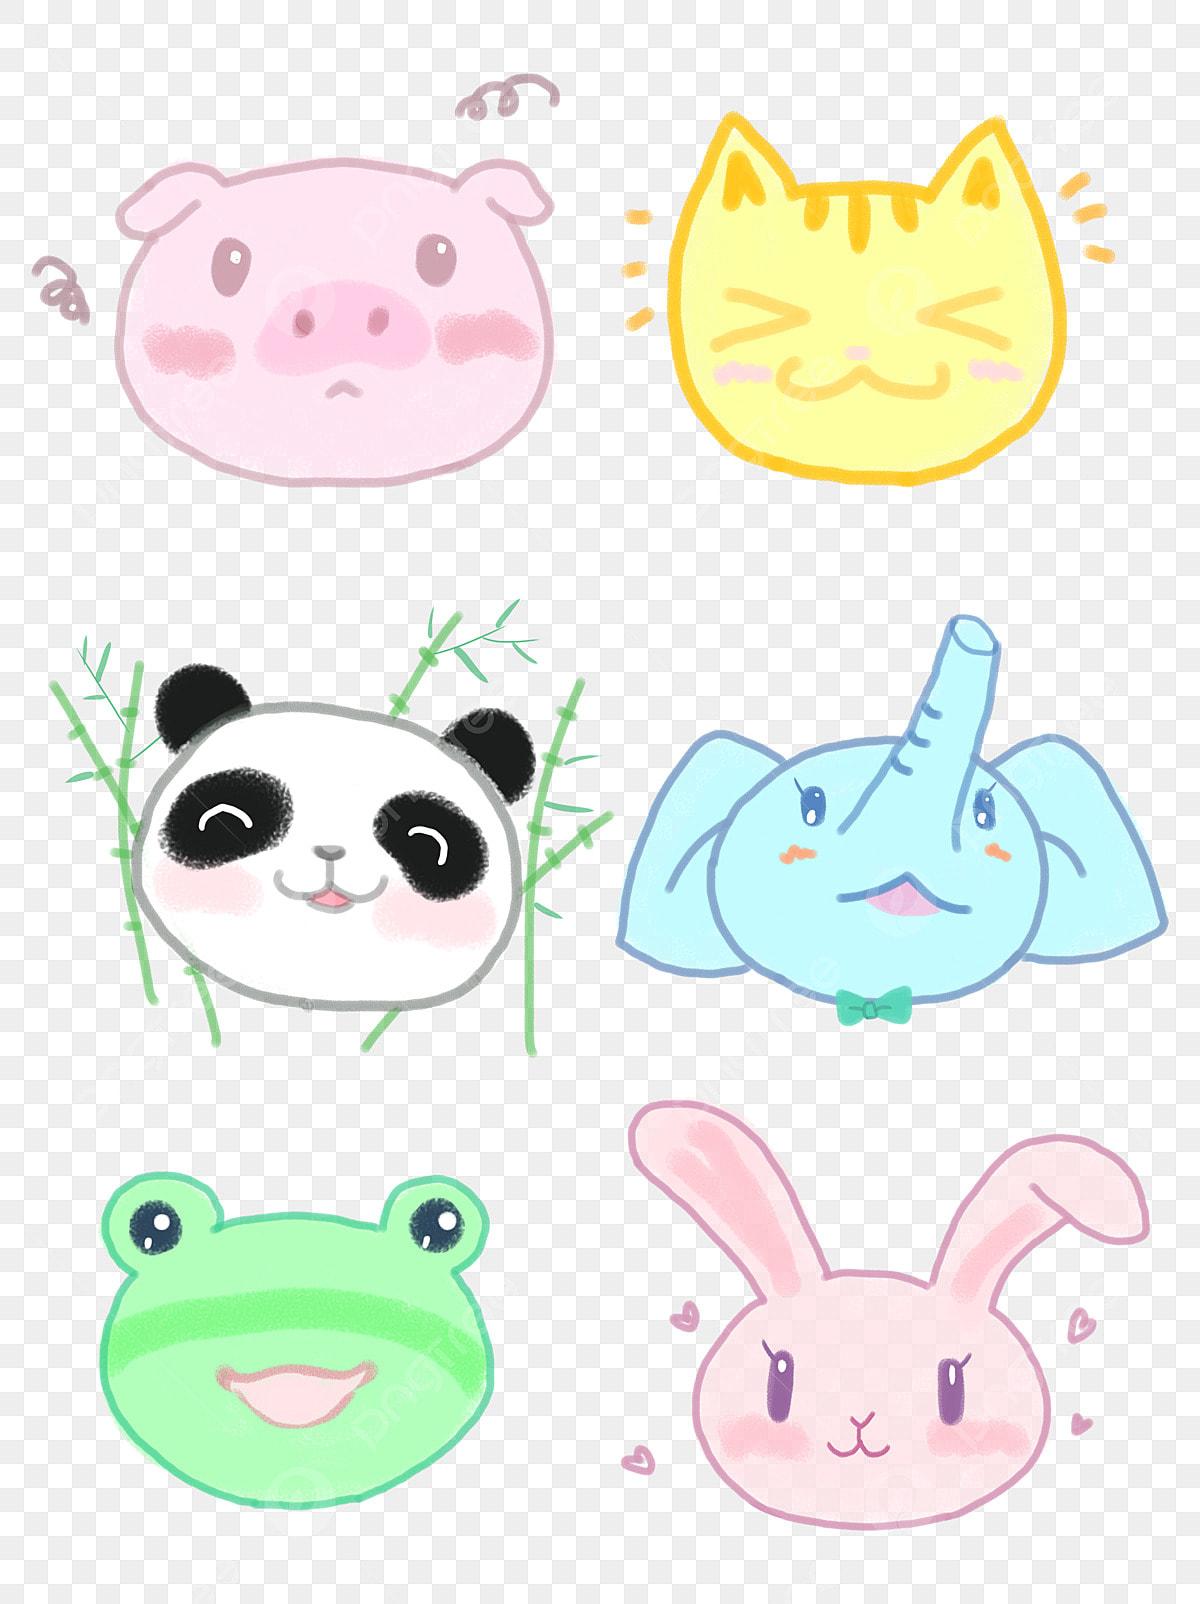 Border Cartoon Hand Drawn Stick Animal Account Element